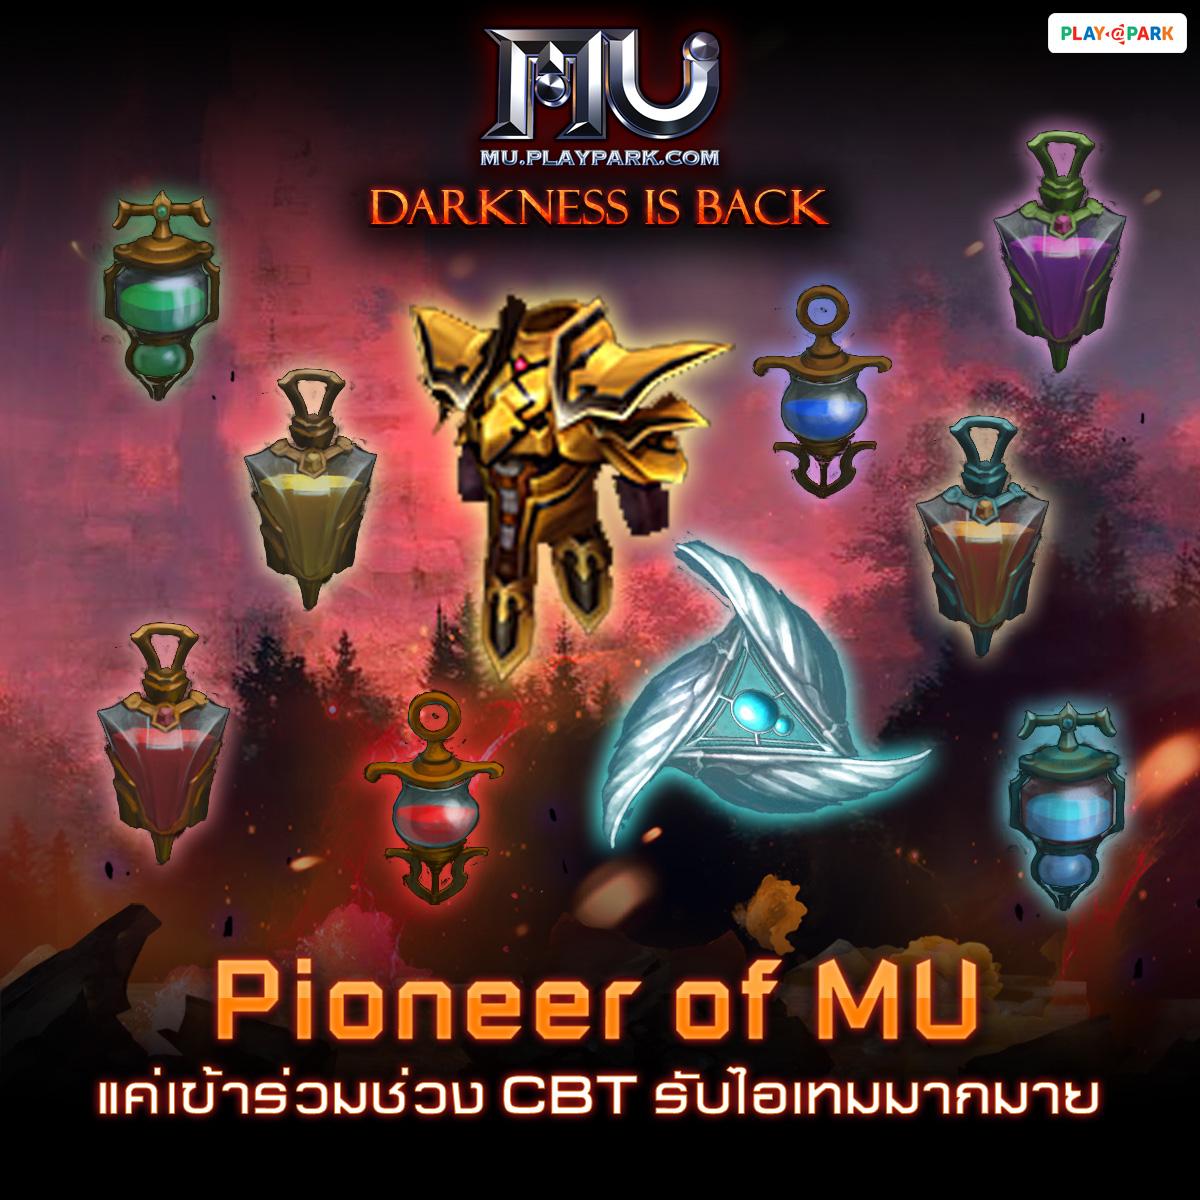 MU Online 632020 2